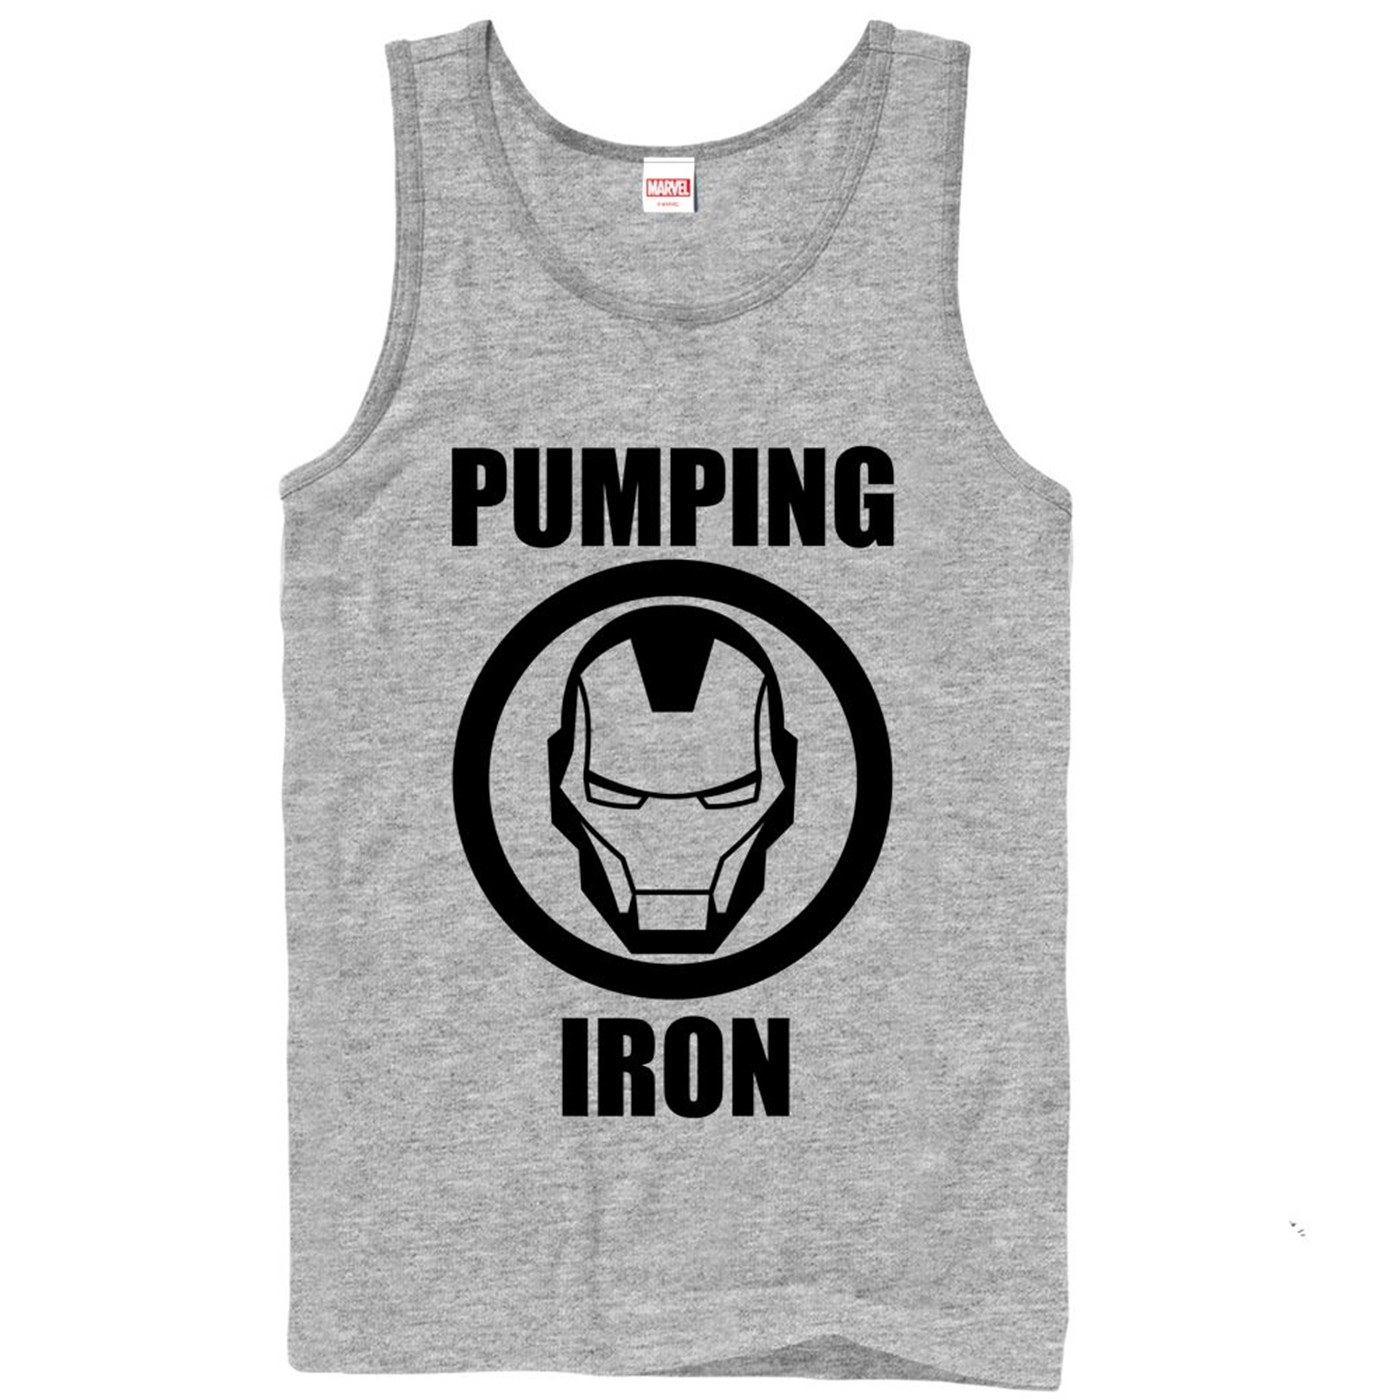 Pumping Iron Tank Top